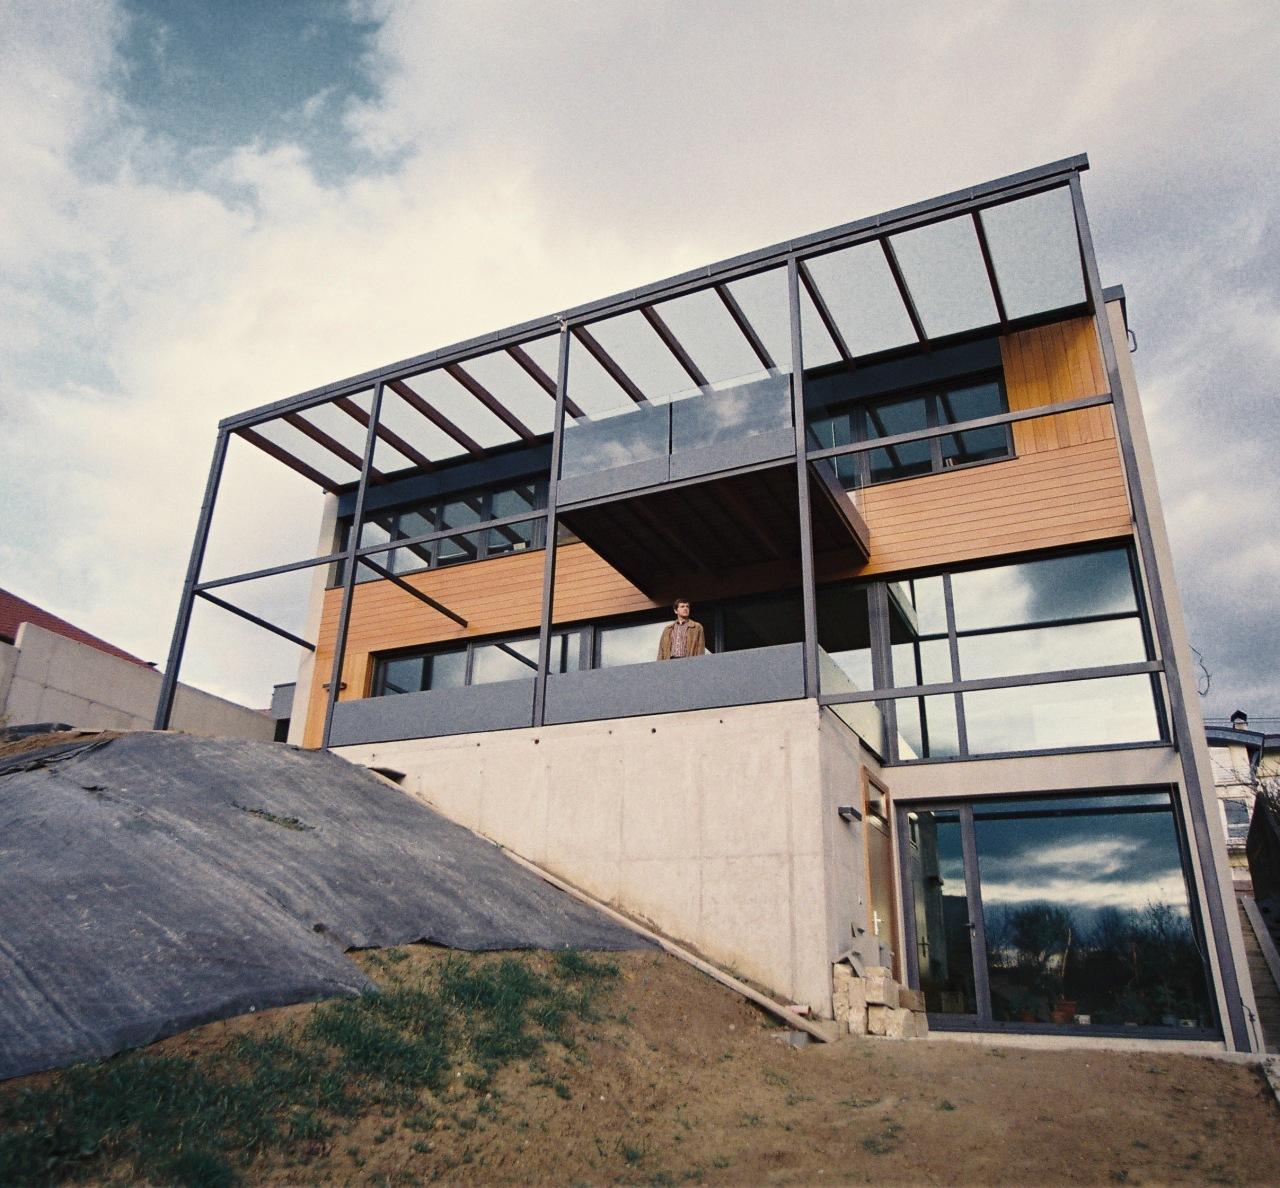 Villa P / Architektonicke Studio Atrium, © Cortesia de Architektonicke Studio Atrium